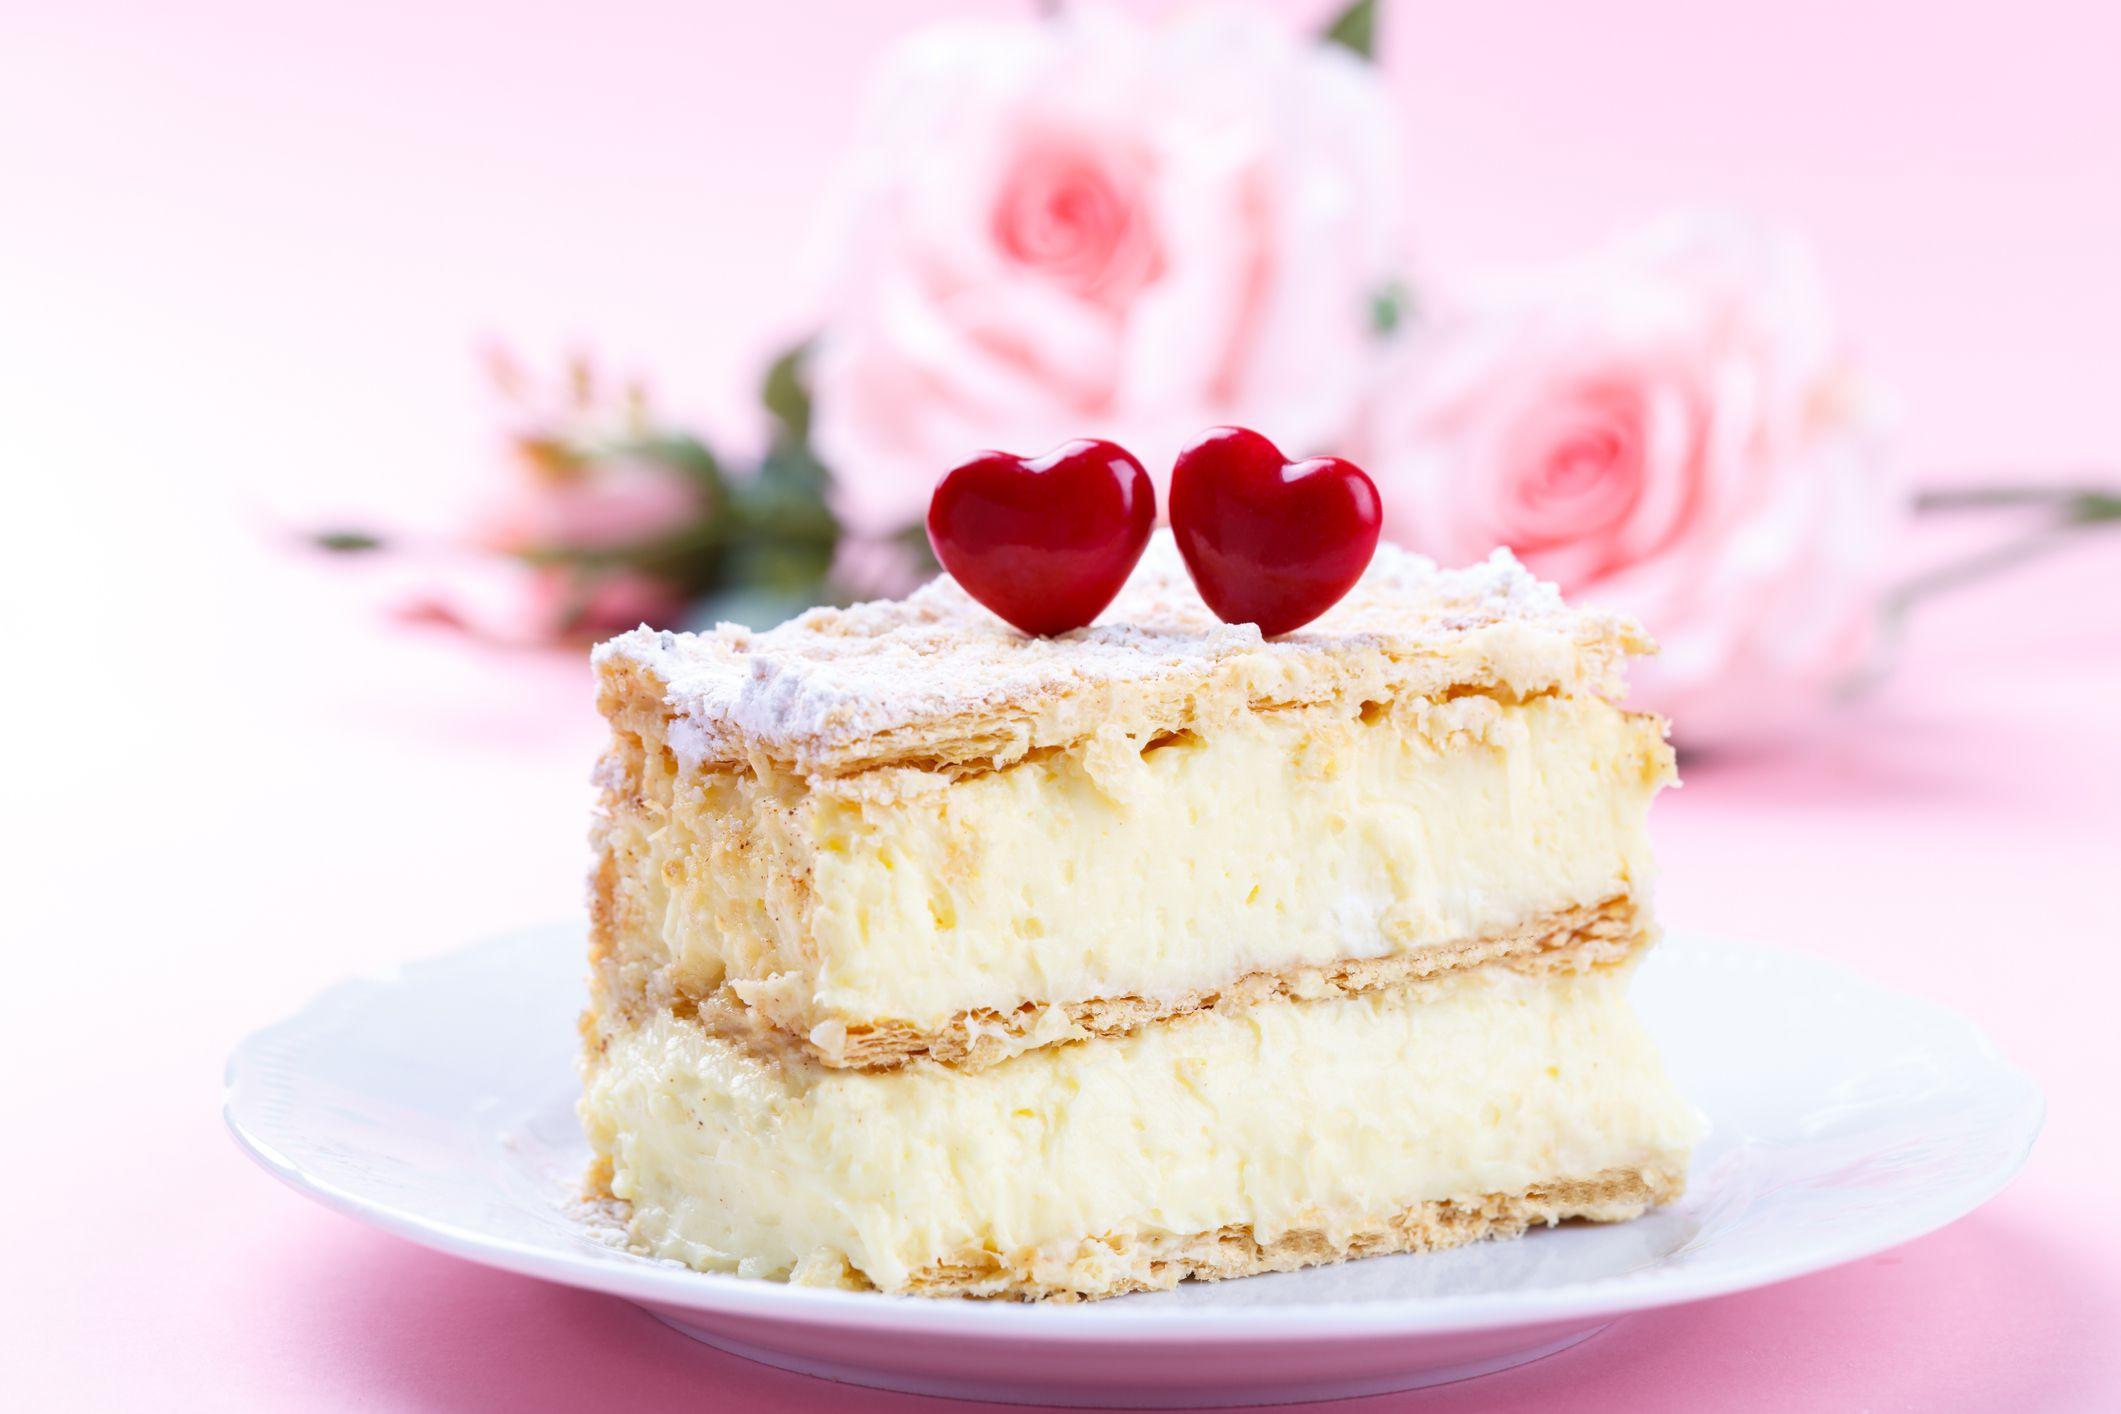 Magnificent Millefoglie Pastry With Zabaglione Filling Recipe Funny Birthday Cards Online Amentibdeldamsfinfo